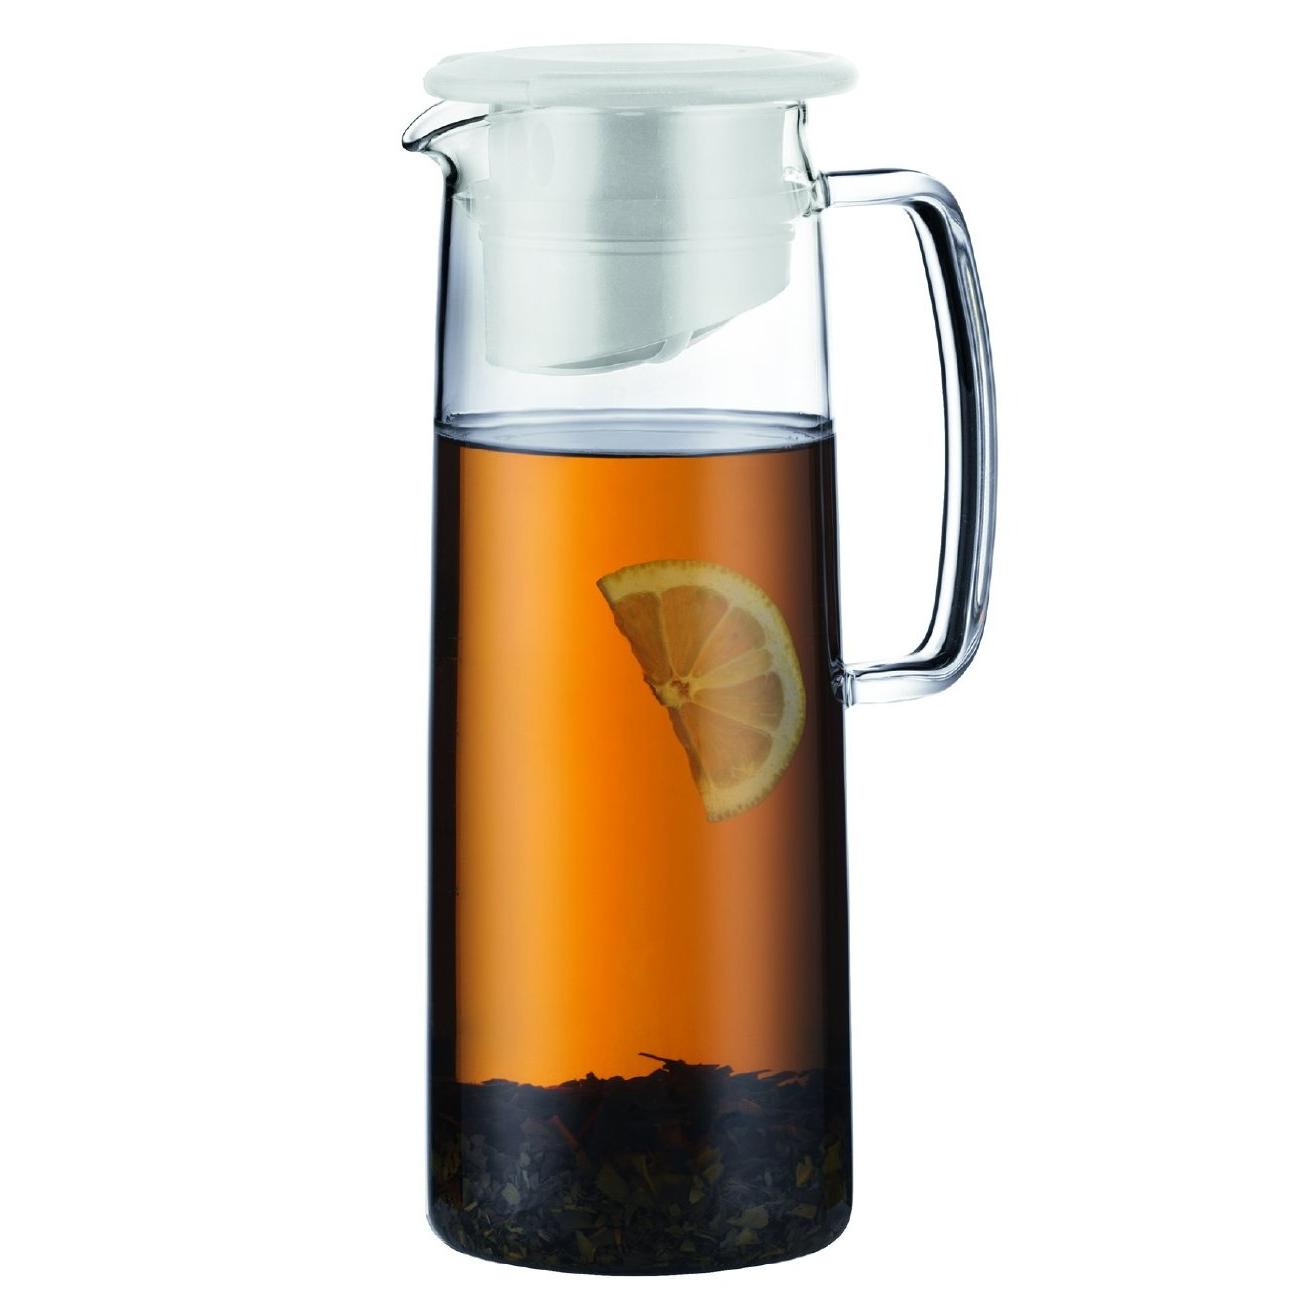 Bodum Biasca Glass 40 Ounce Ice Green Tea Jug with White Lid